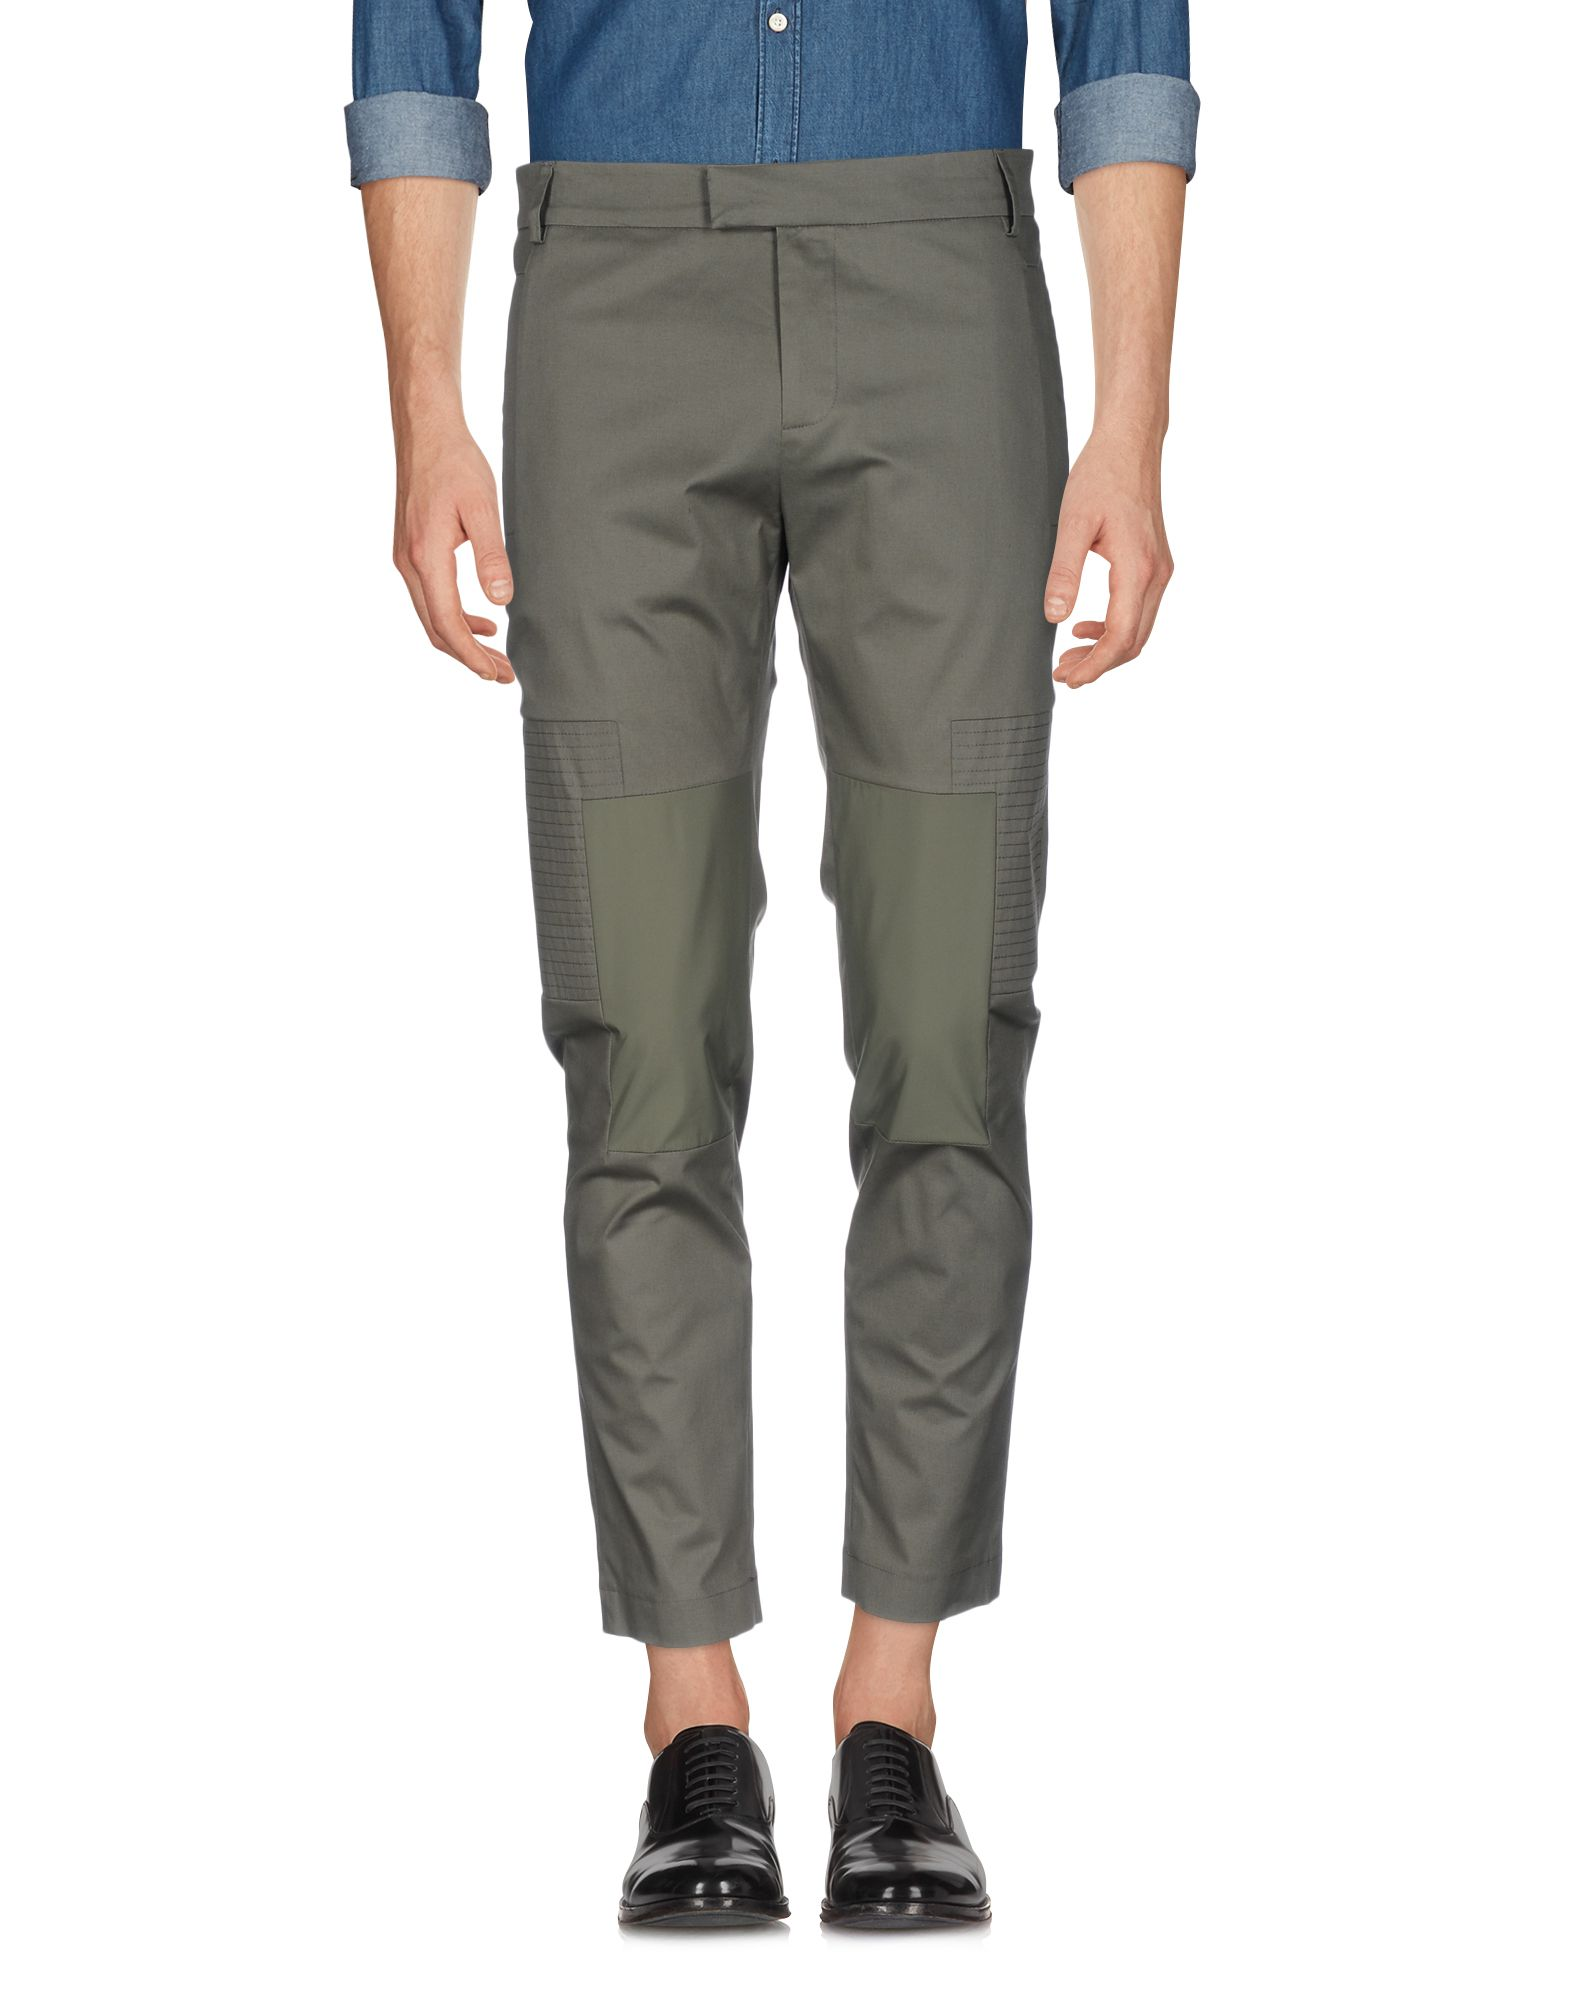 Pantalone Les Hommes Uomo - Acquista online su